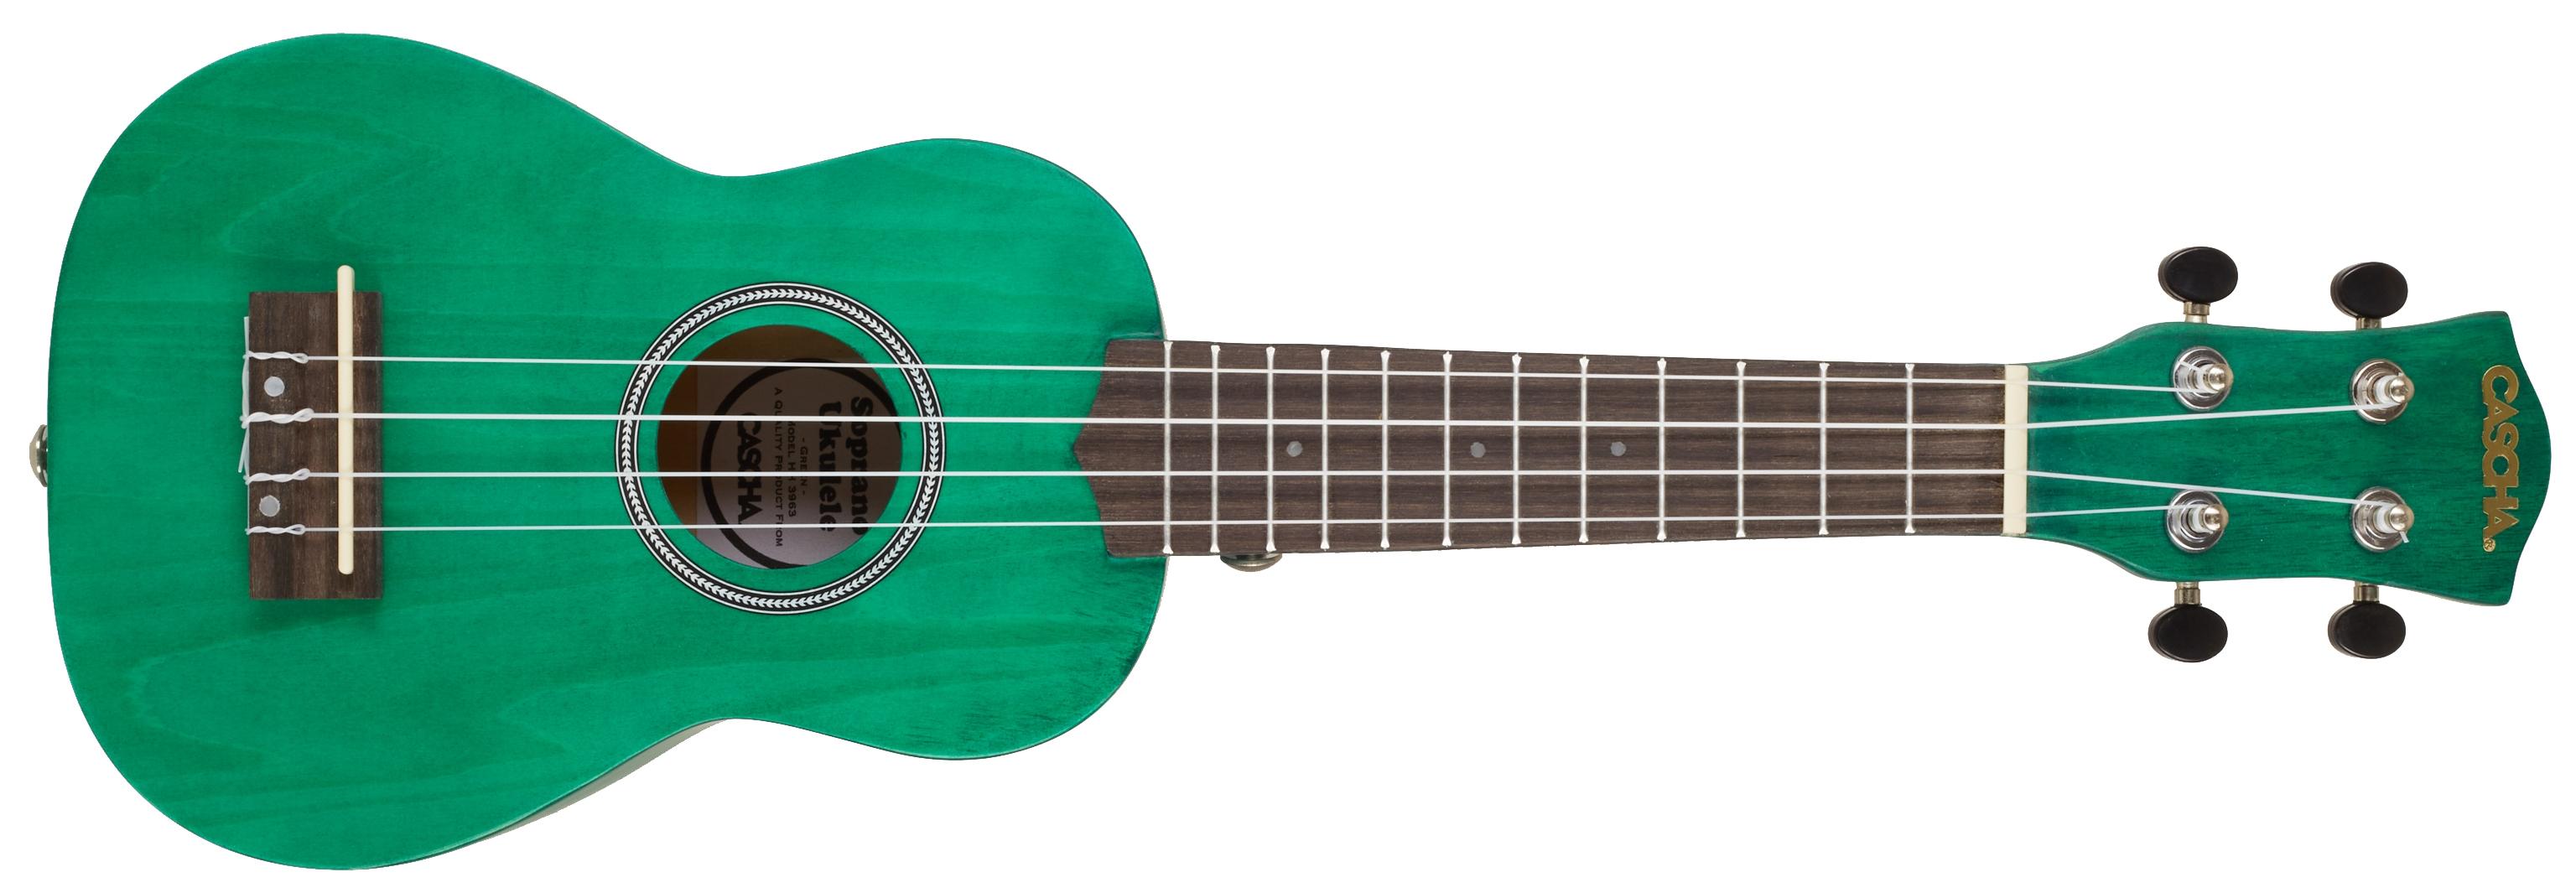 CASCHA HH 3972 EN Soprano Ukulele Bundle Green